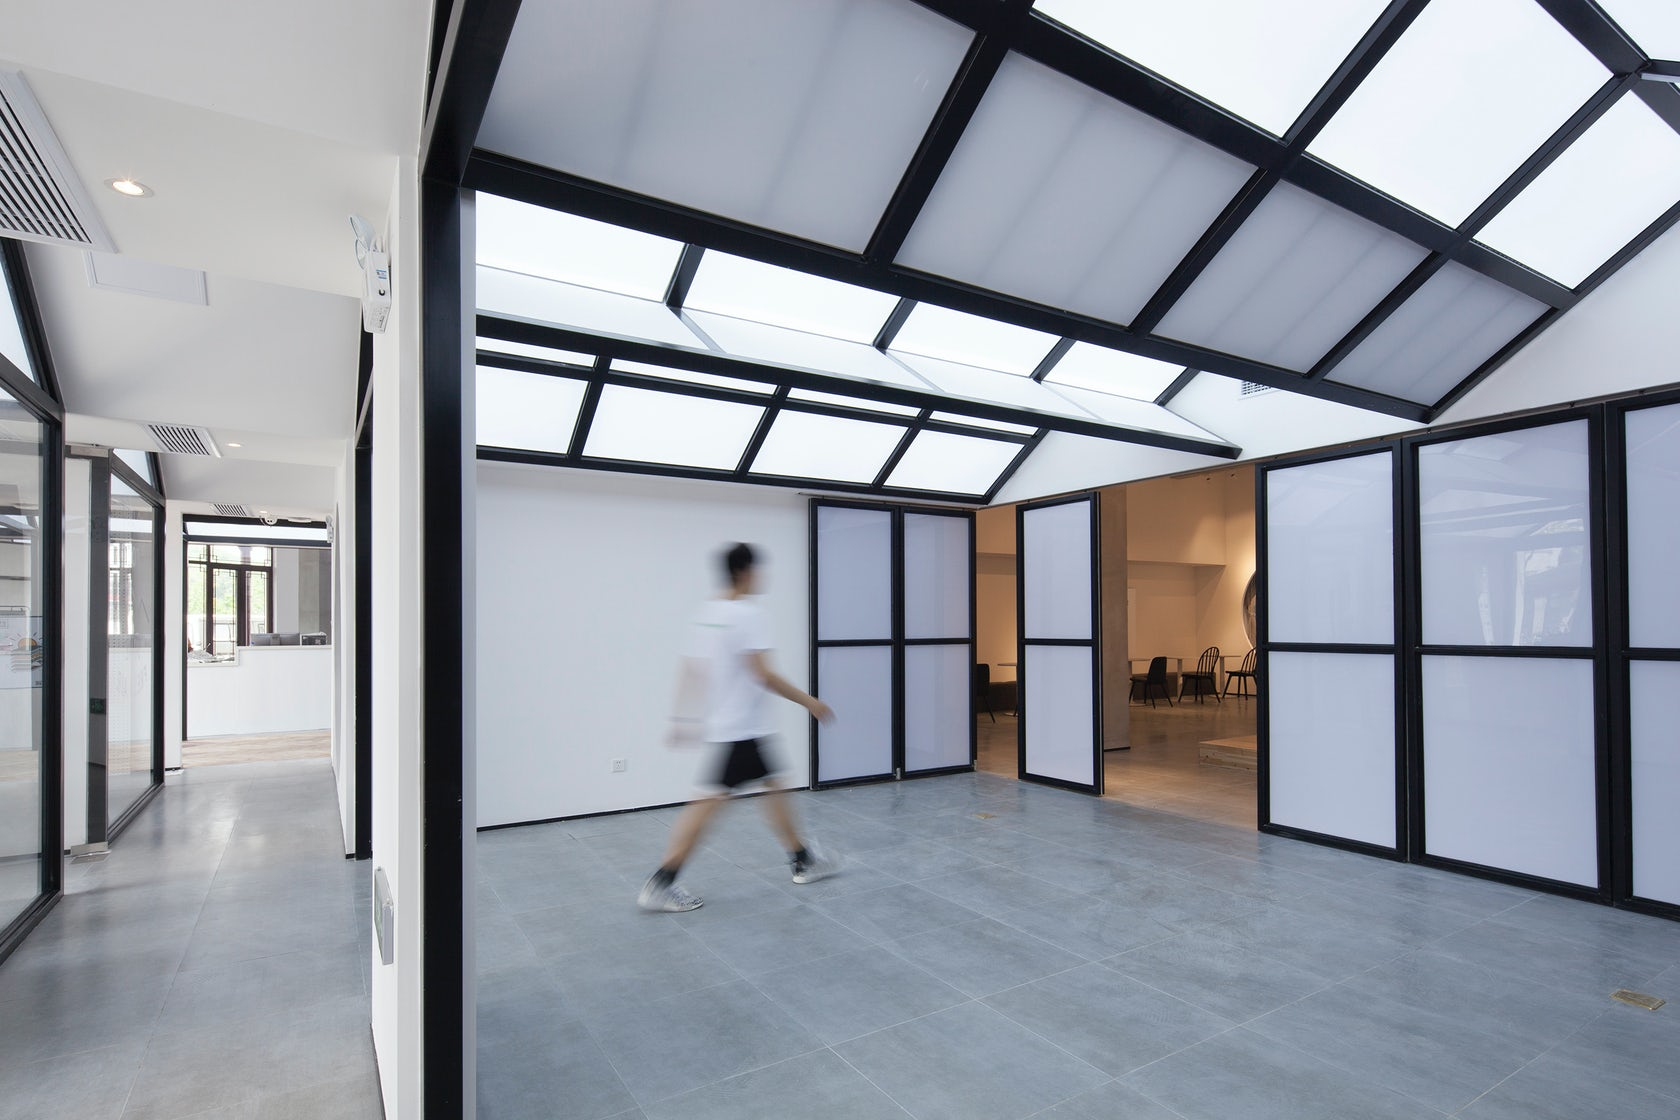 Front Shop & Rear Dorm—Together · Venue Fawn Hostel Suzhou